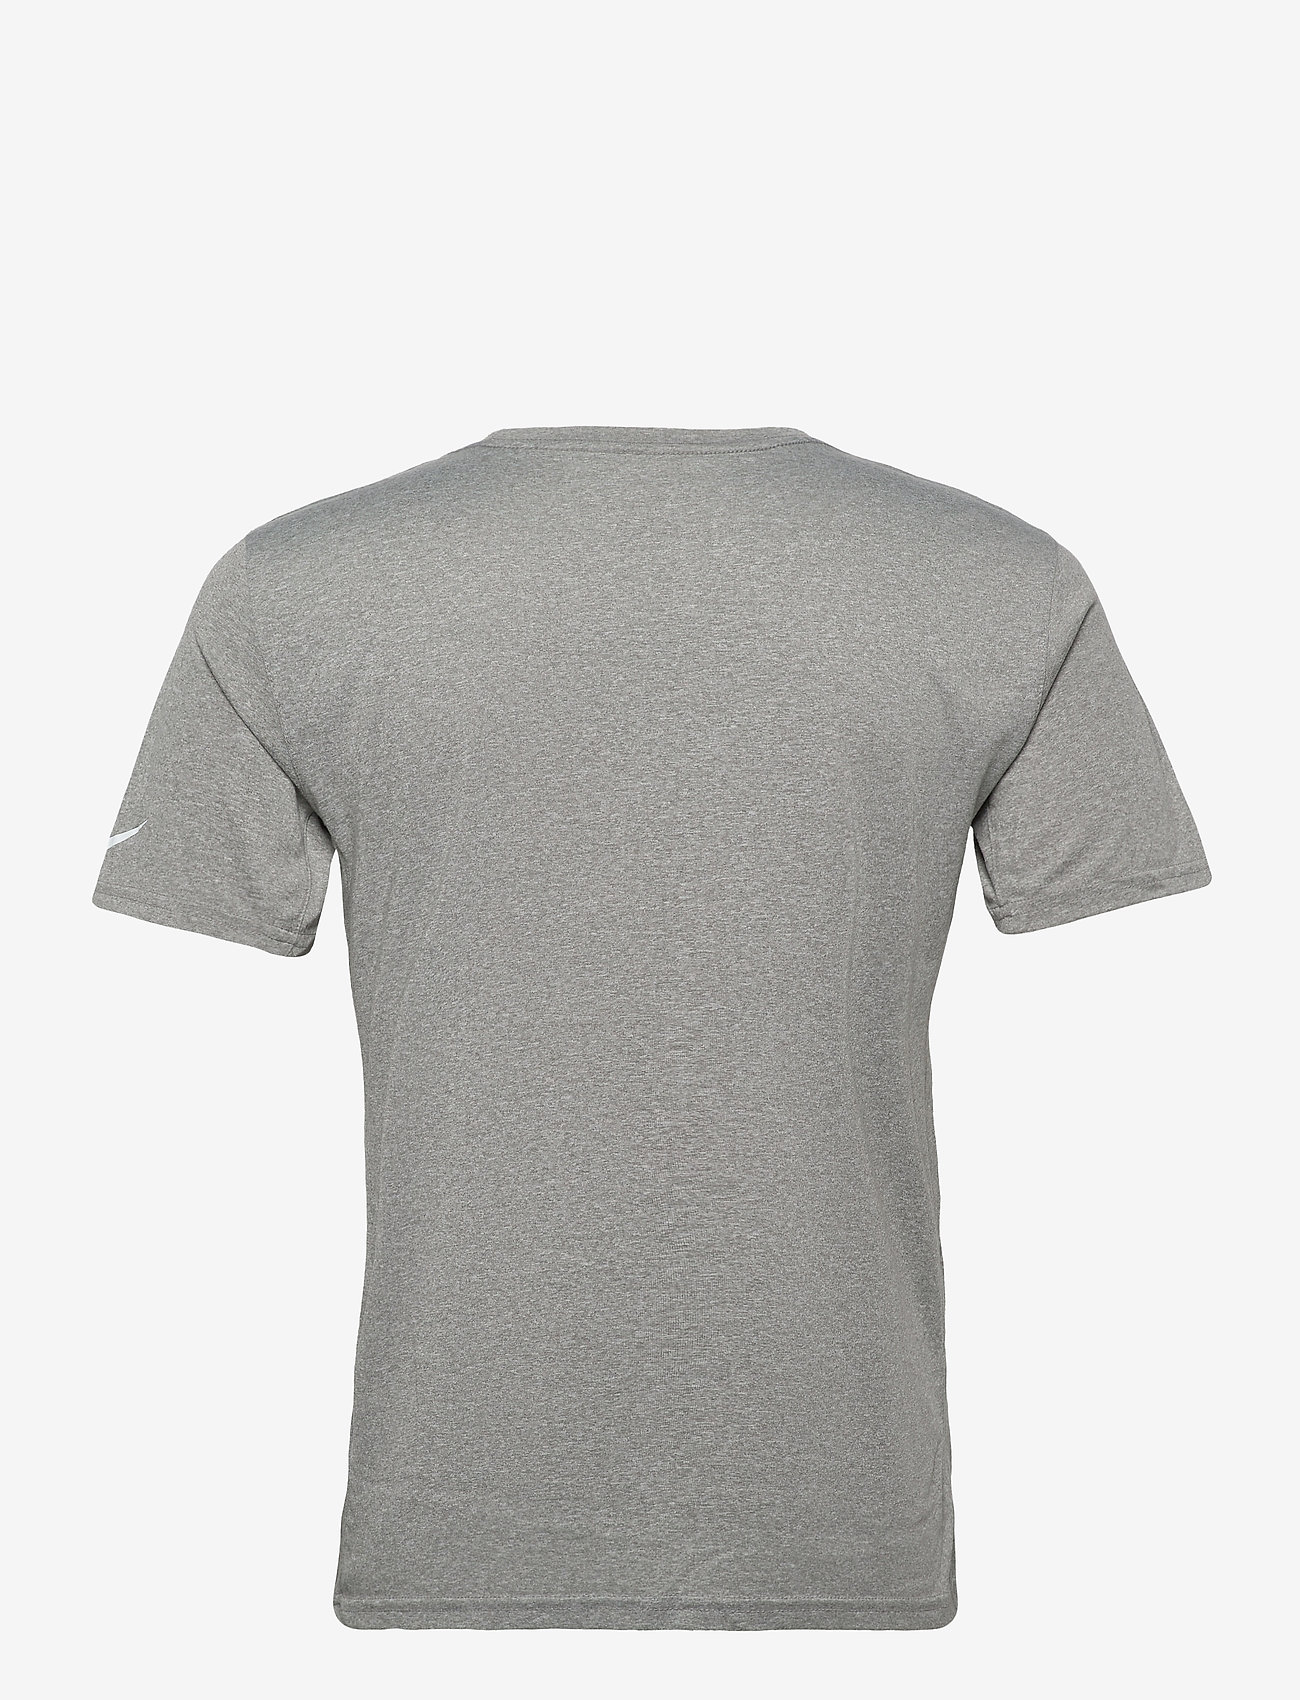 NIKE Fan Gear New York Giants Nike Icon Essential T-Shirt - T-skjorter DARK GREY HEATHER - Menn Klær